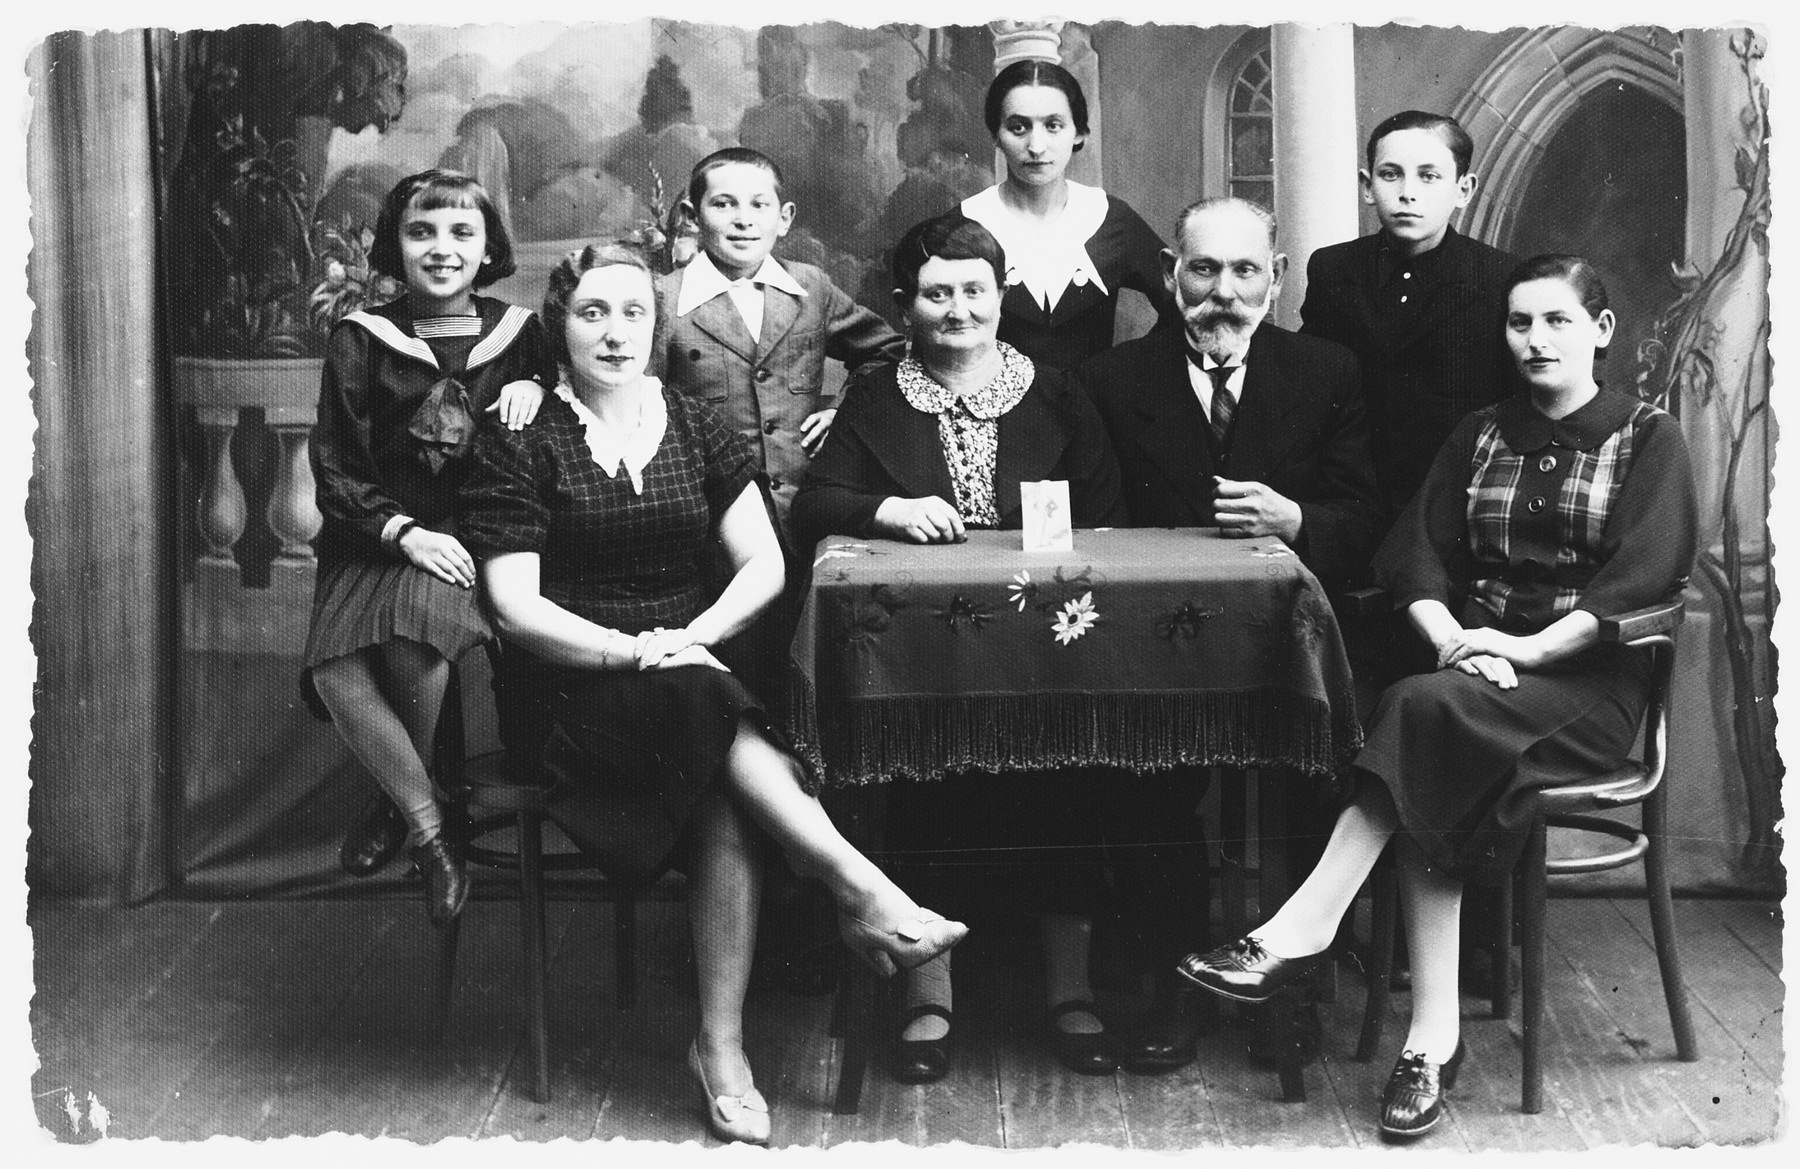 Prewar portrait of the Zisman family in Zelow, Poland.